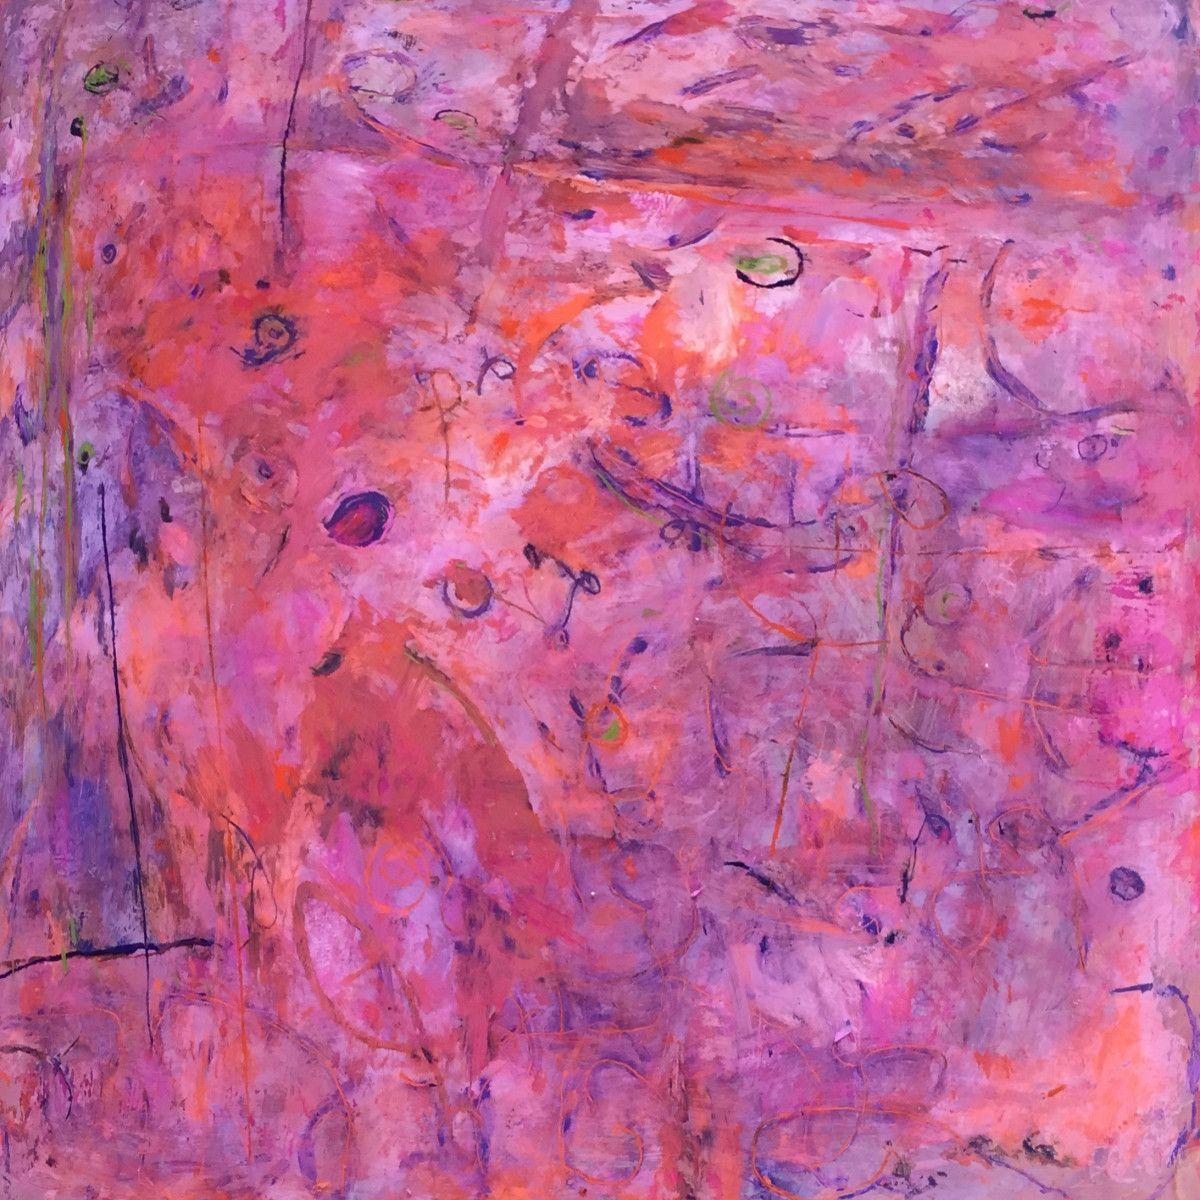 Maria Hughes.  Tono Rosa I , Pigment on Plexiglass, 20 x 20 in.